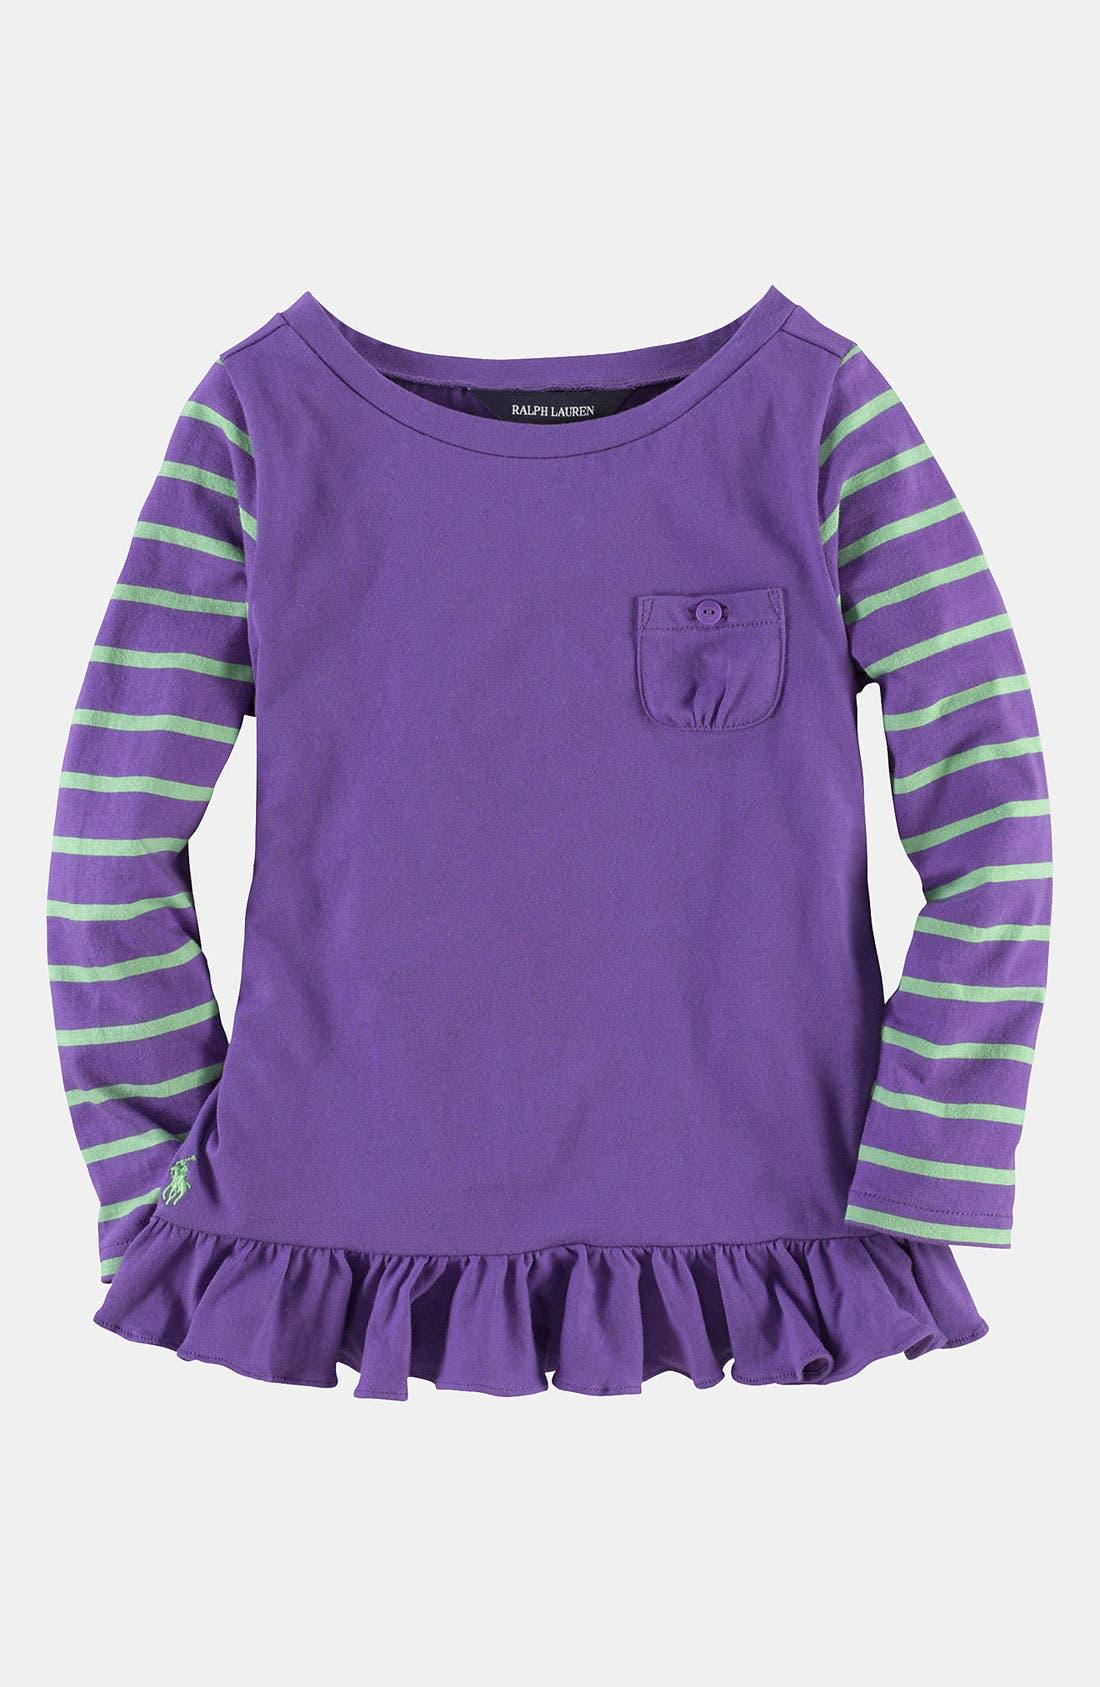 Main Image - Ralph Lauren Stripe Sleeve Tee (Toddler)